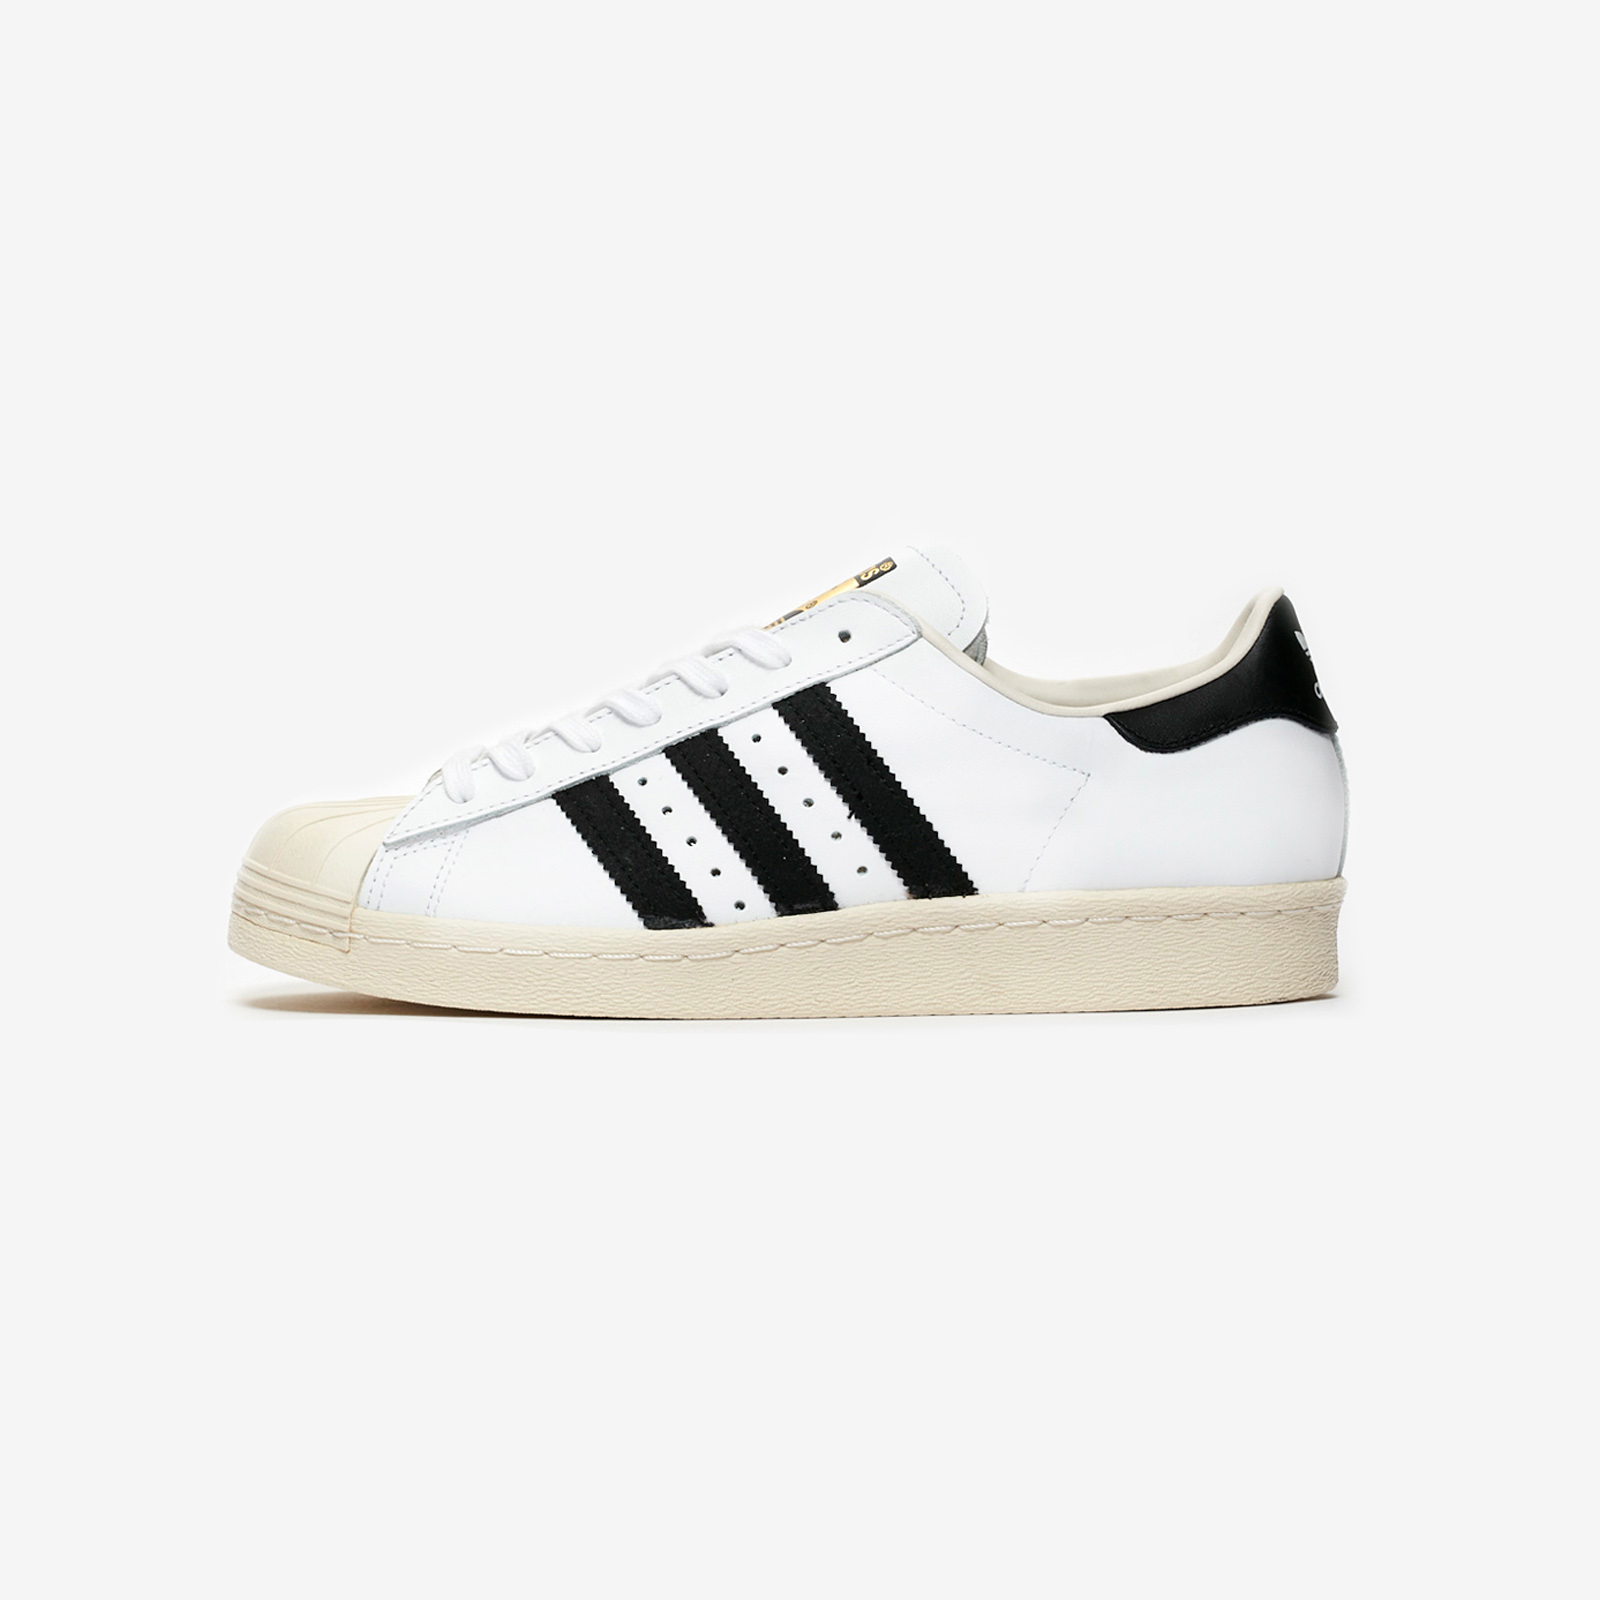 adidas Superstar 80s G61070 Sneakersnstuff | sneakers